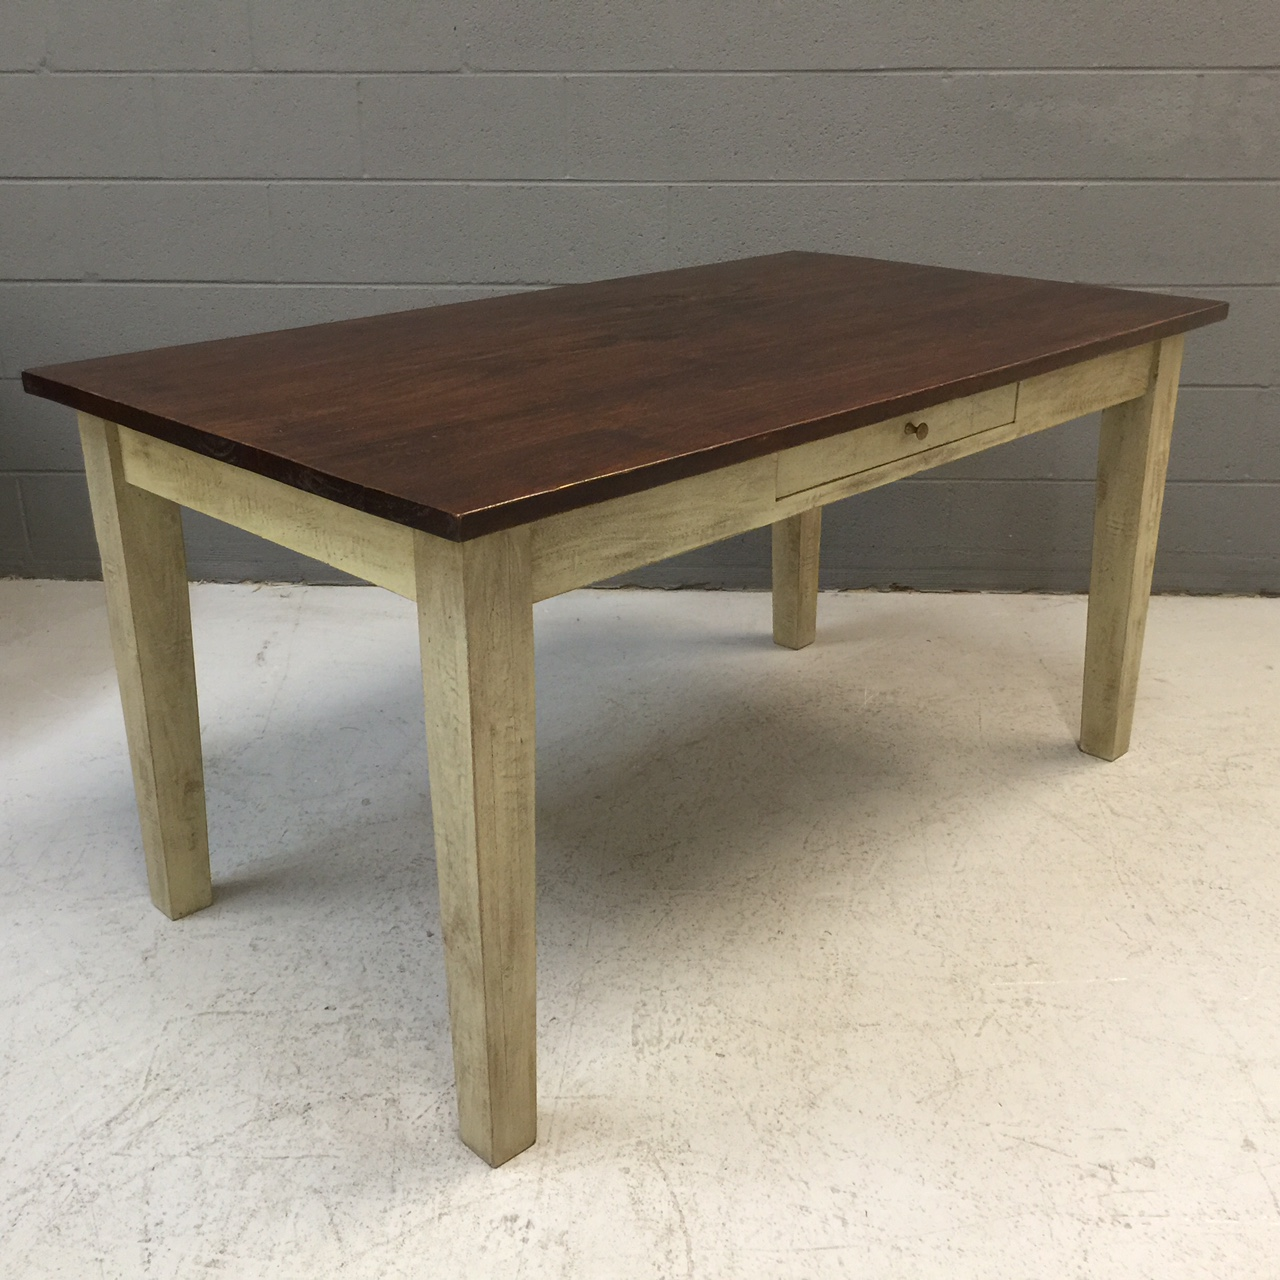 Amazing Nadeau Furniture Nashville #16 - Dining Table